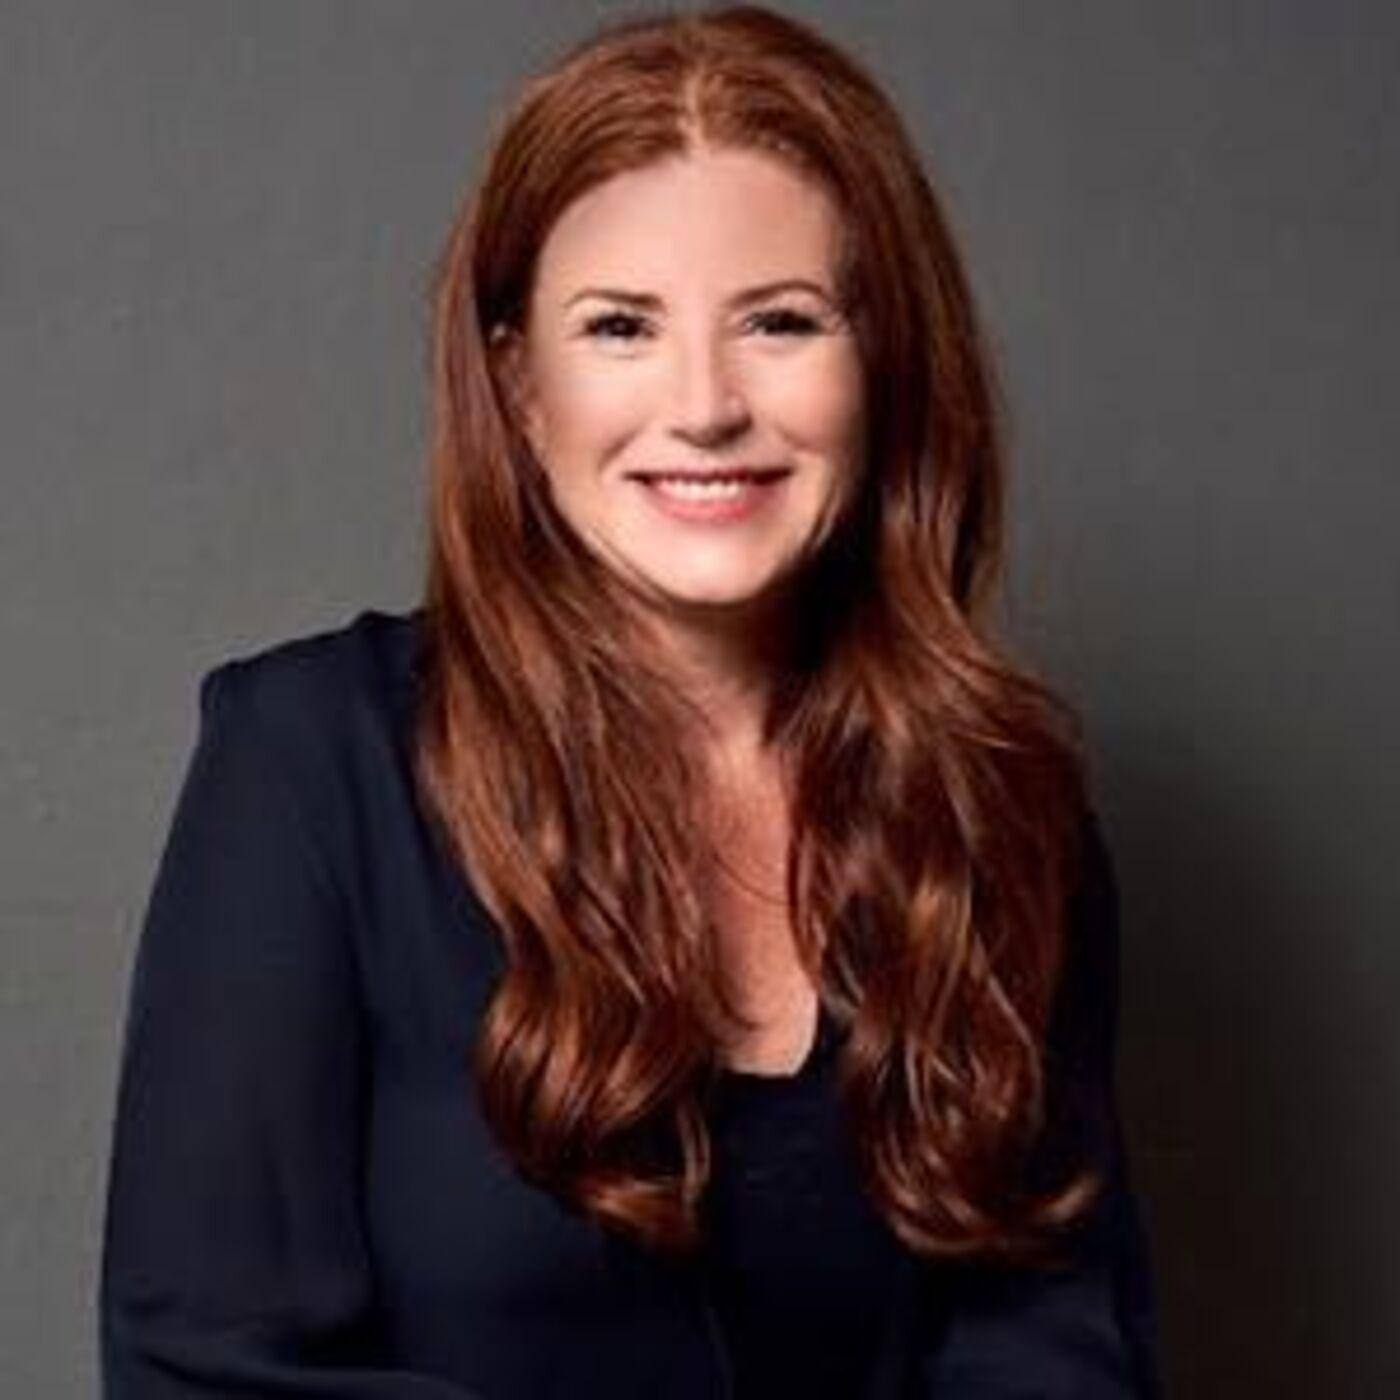 #101: Kara Goldin Founder & CEO of Hint